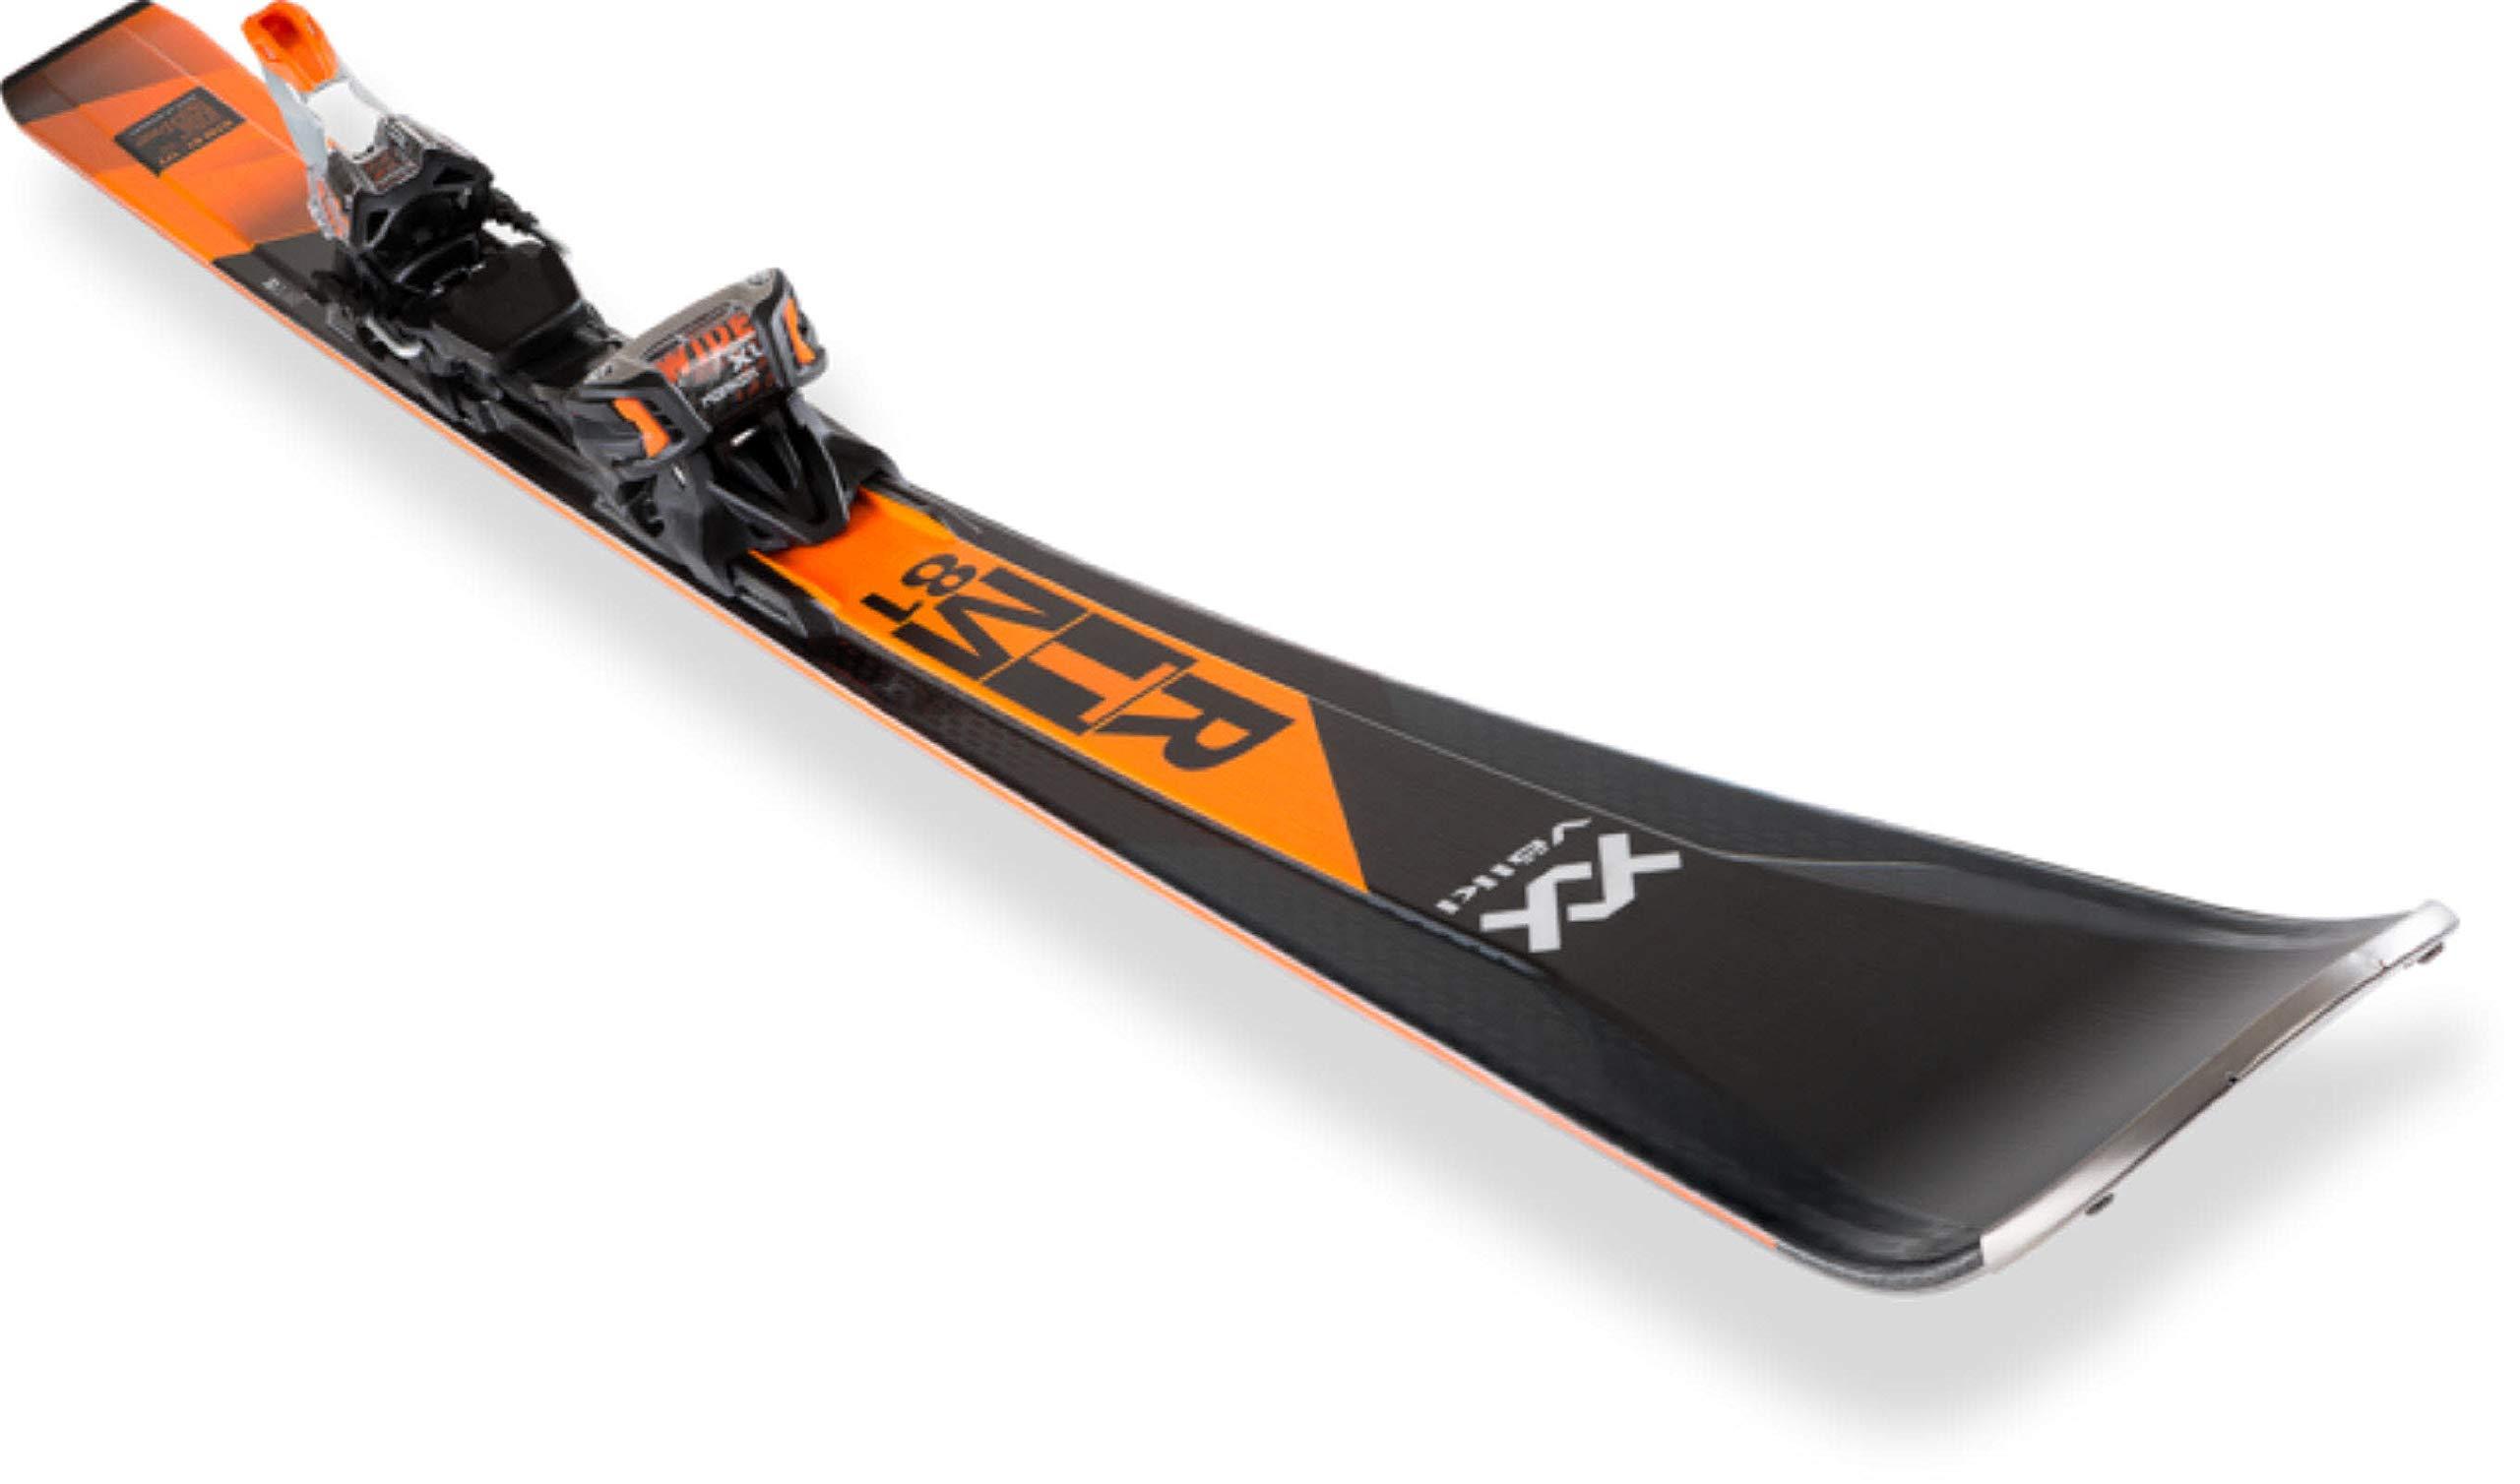 Volkl 2019 RTM 81 Skis with iPT WR XL 12.0 TCX GW Bindings (170) by Volkl